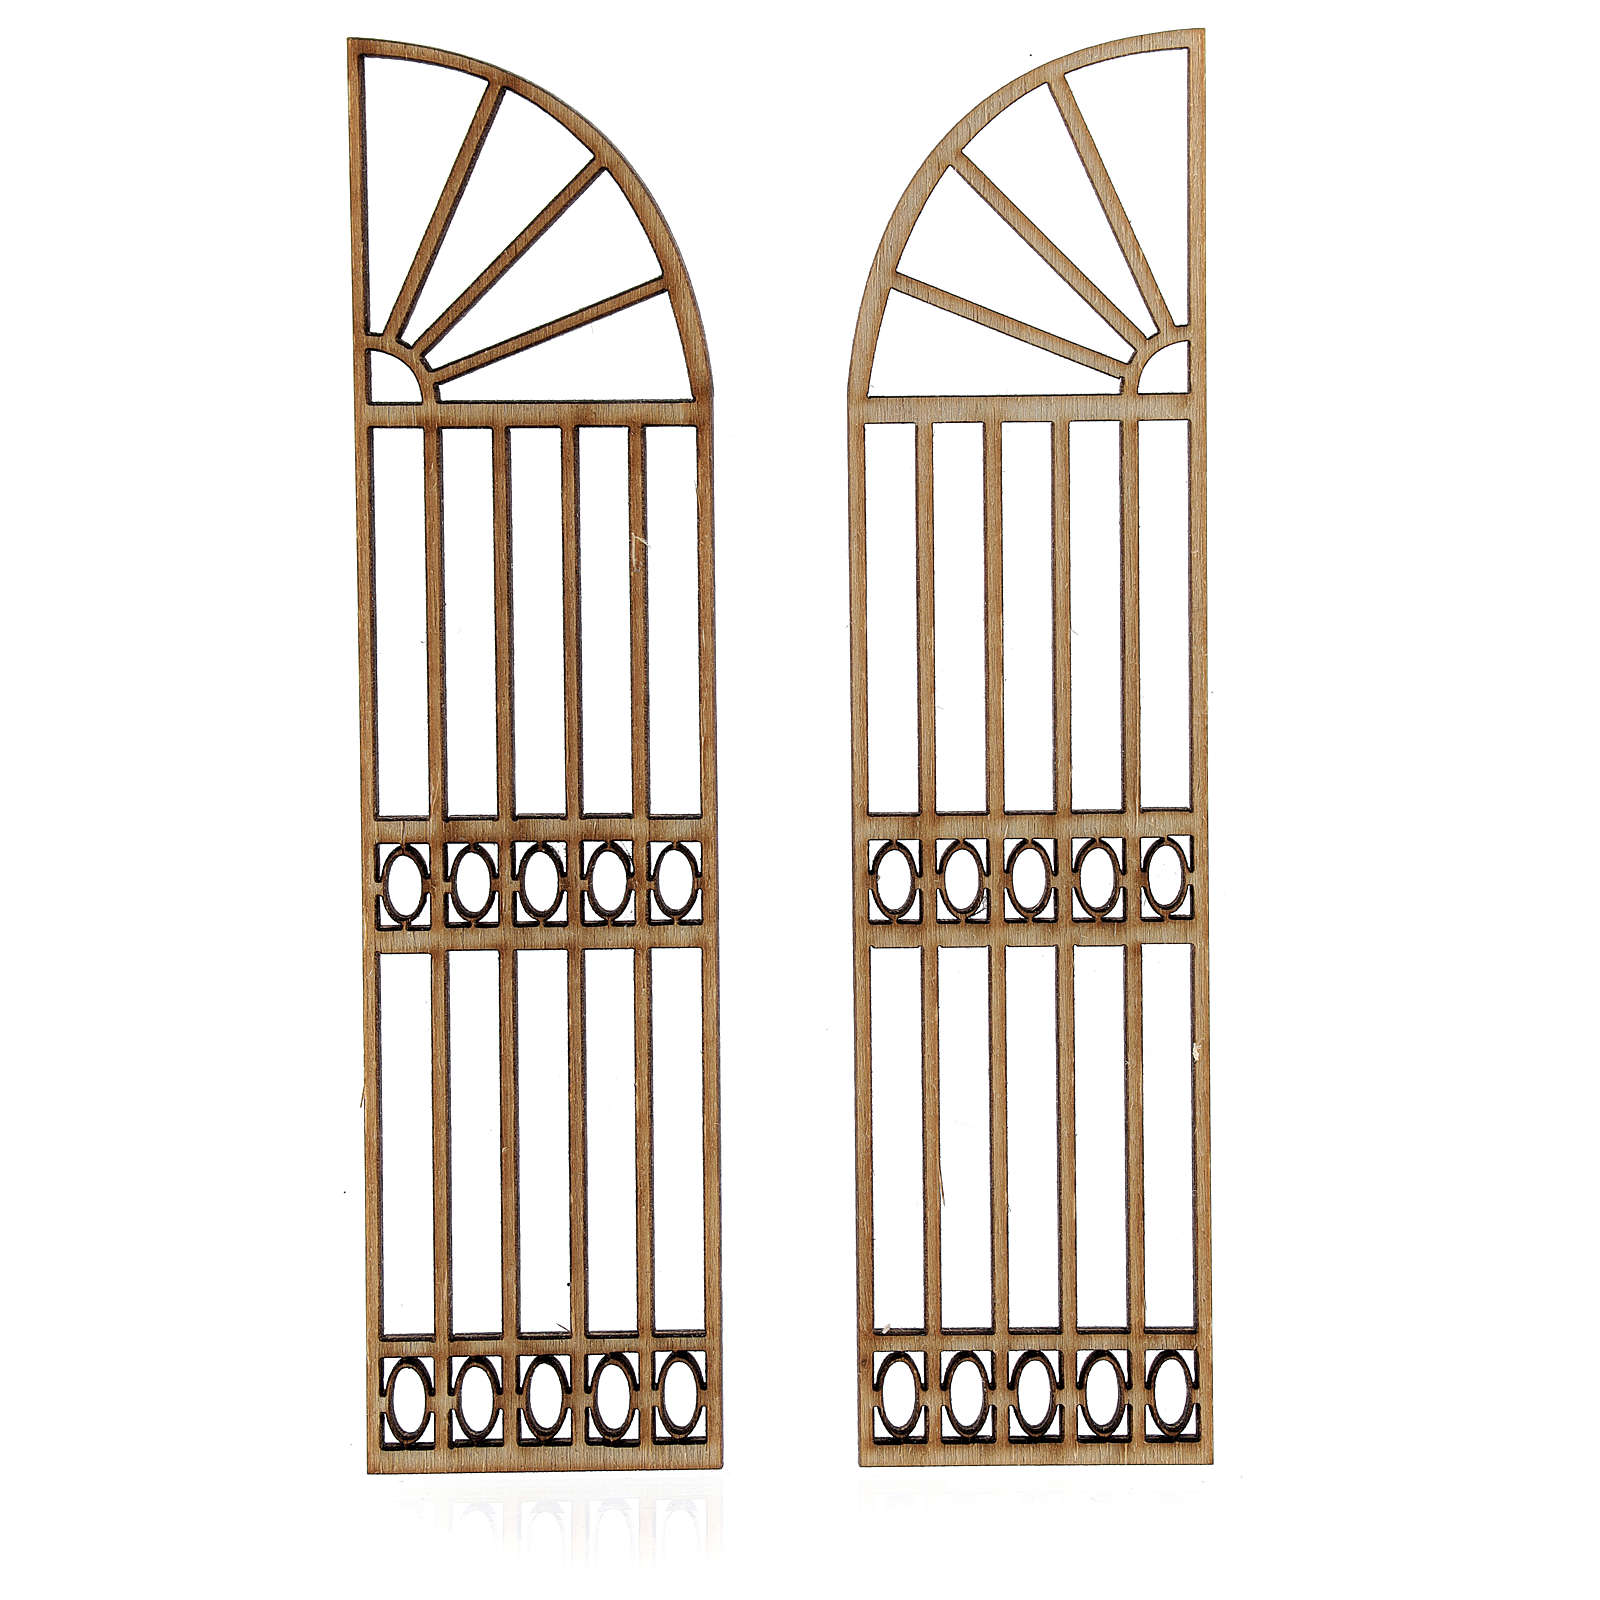 Nativity accessory, wooden gate, 2 pieces 15x7.5cm 4